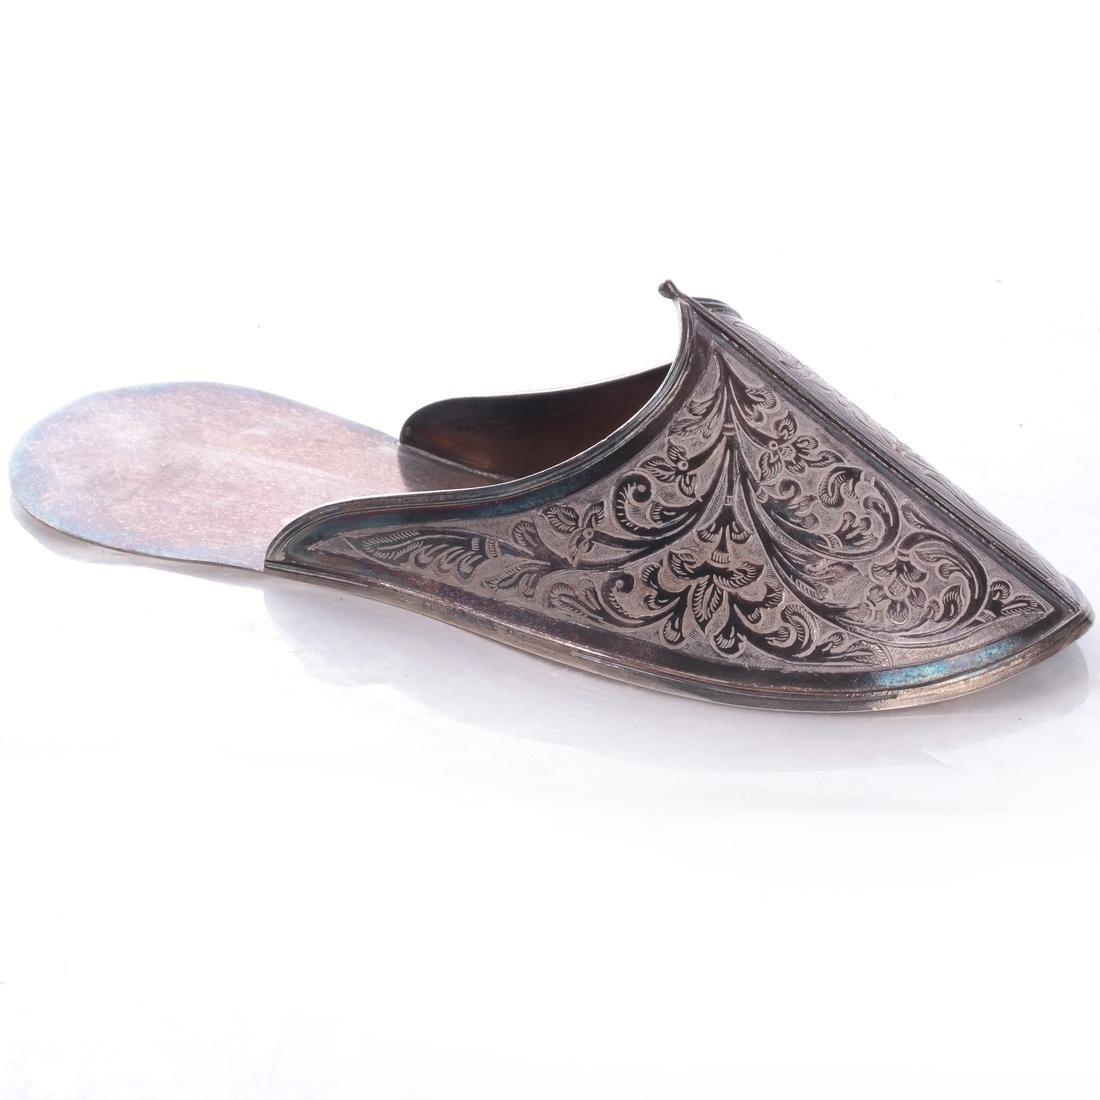 Ottoman: .925 Sterling Silver Persian/Ottoman Shoe - 3